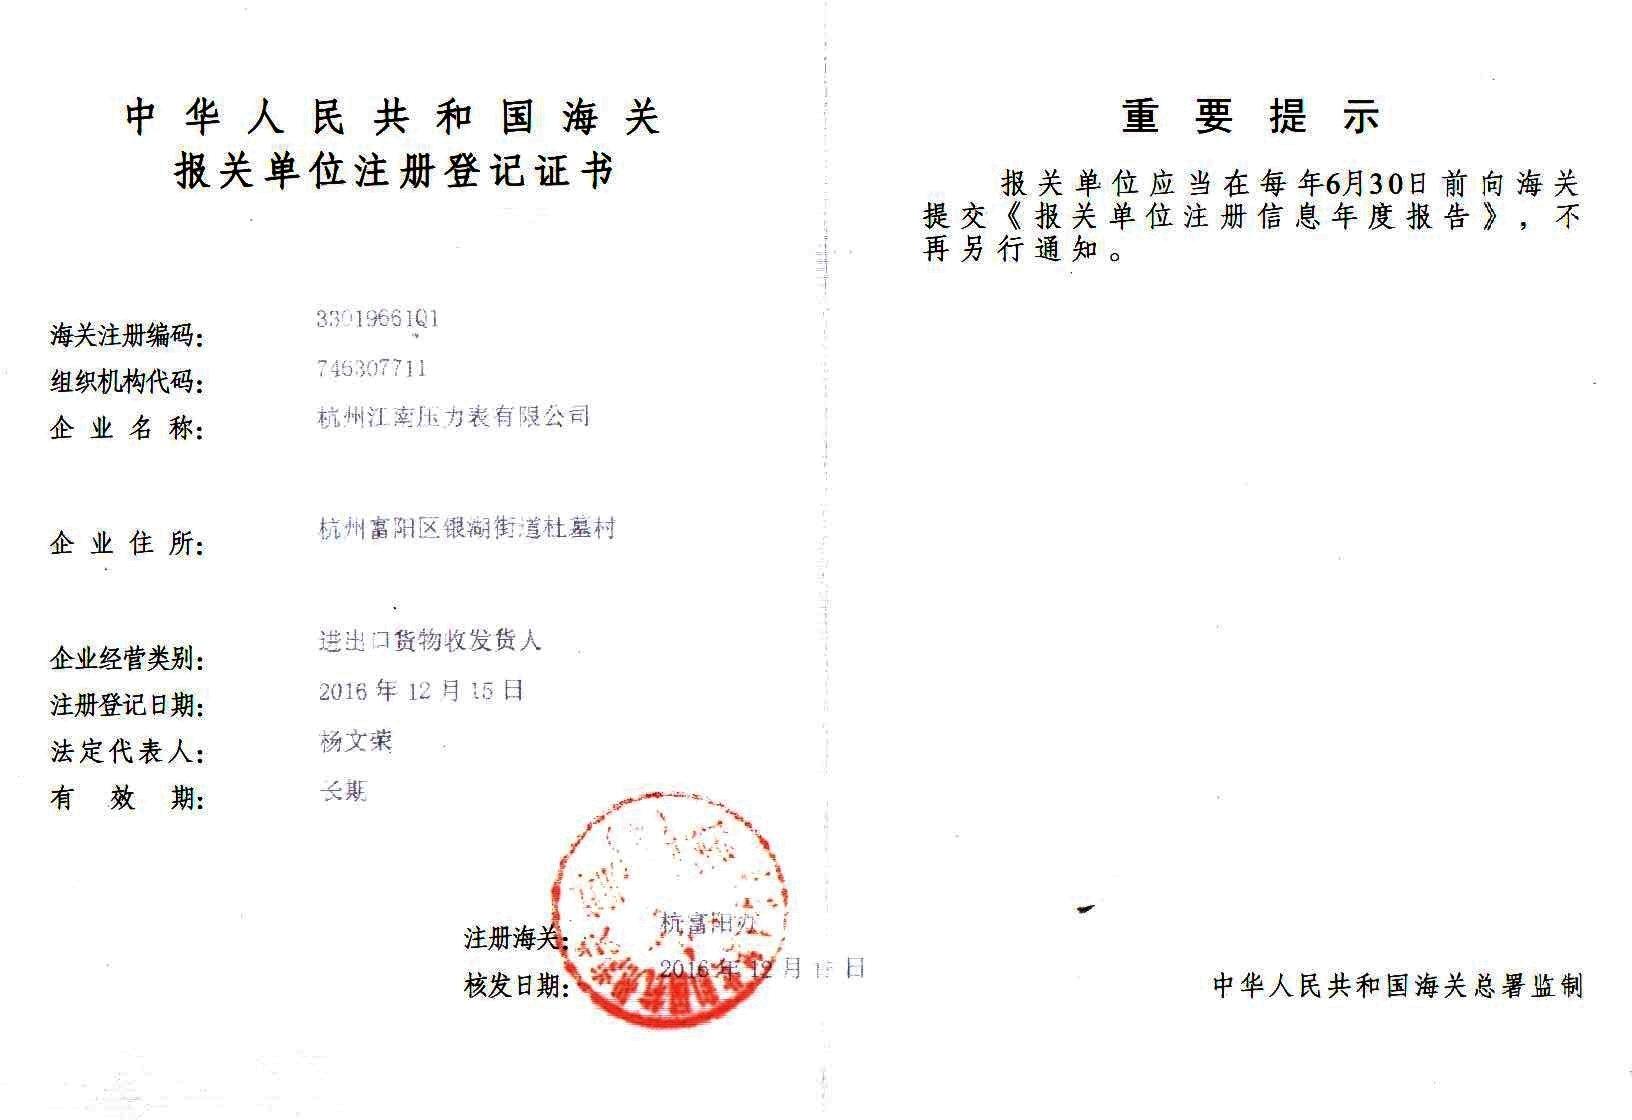 Declaration Entity Registration Certificate